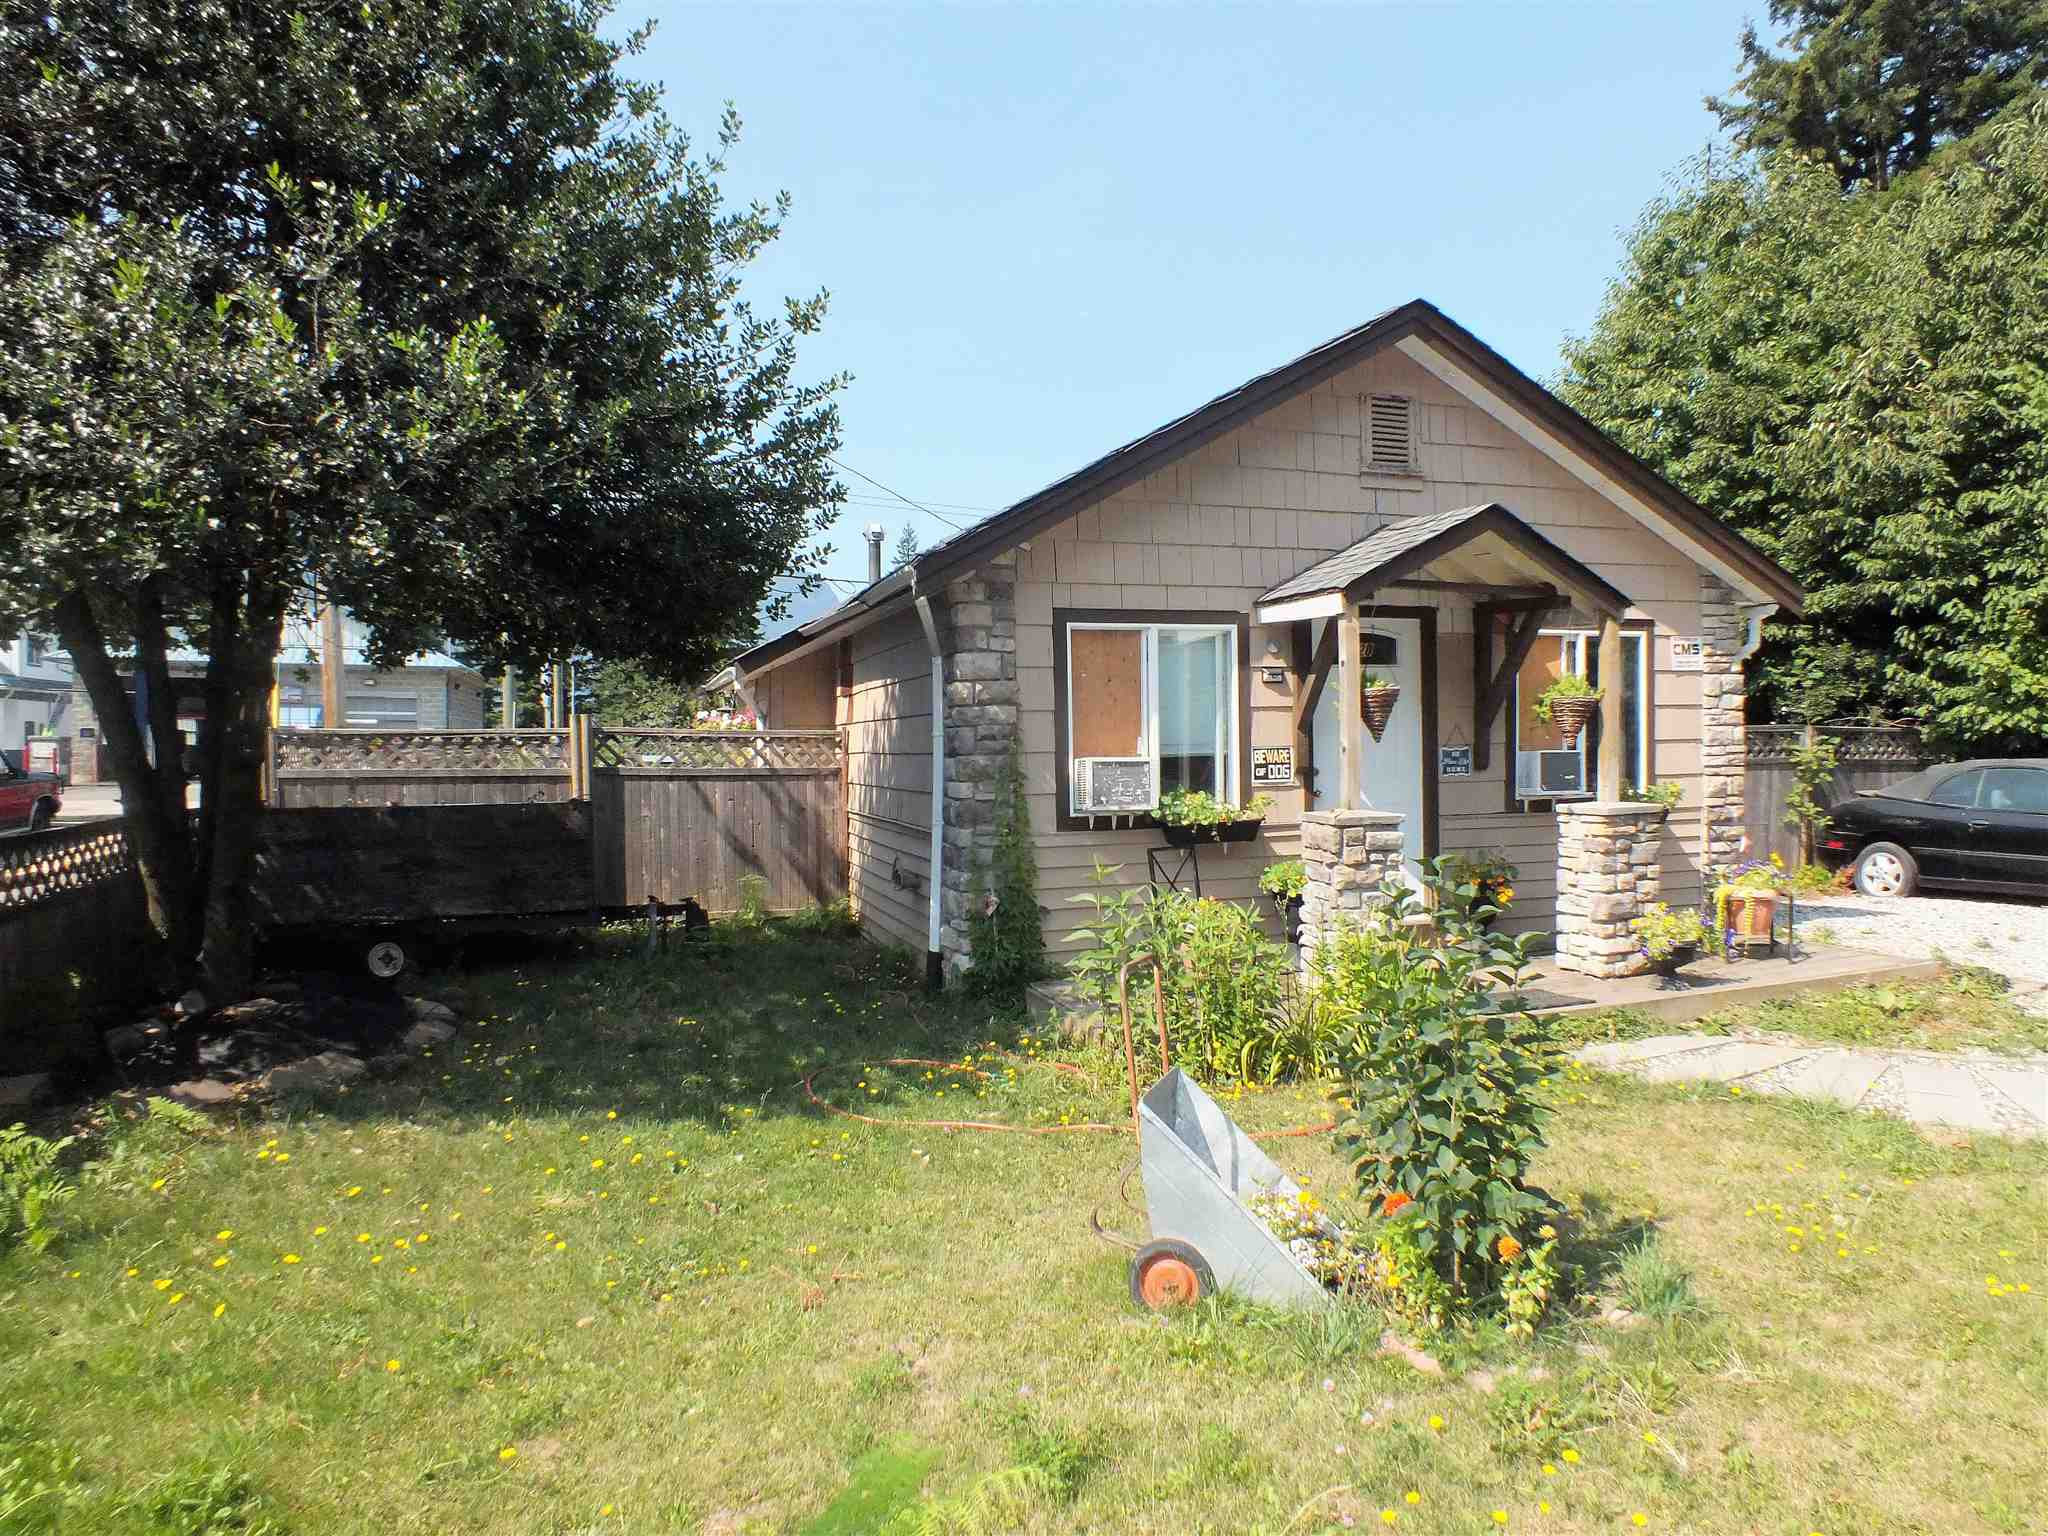 720 FRASER AVENUE - Hope Center House/Single Family for sale, 2 Bedrooms (R2606112)